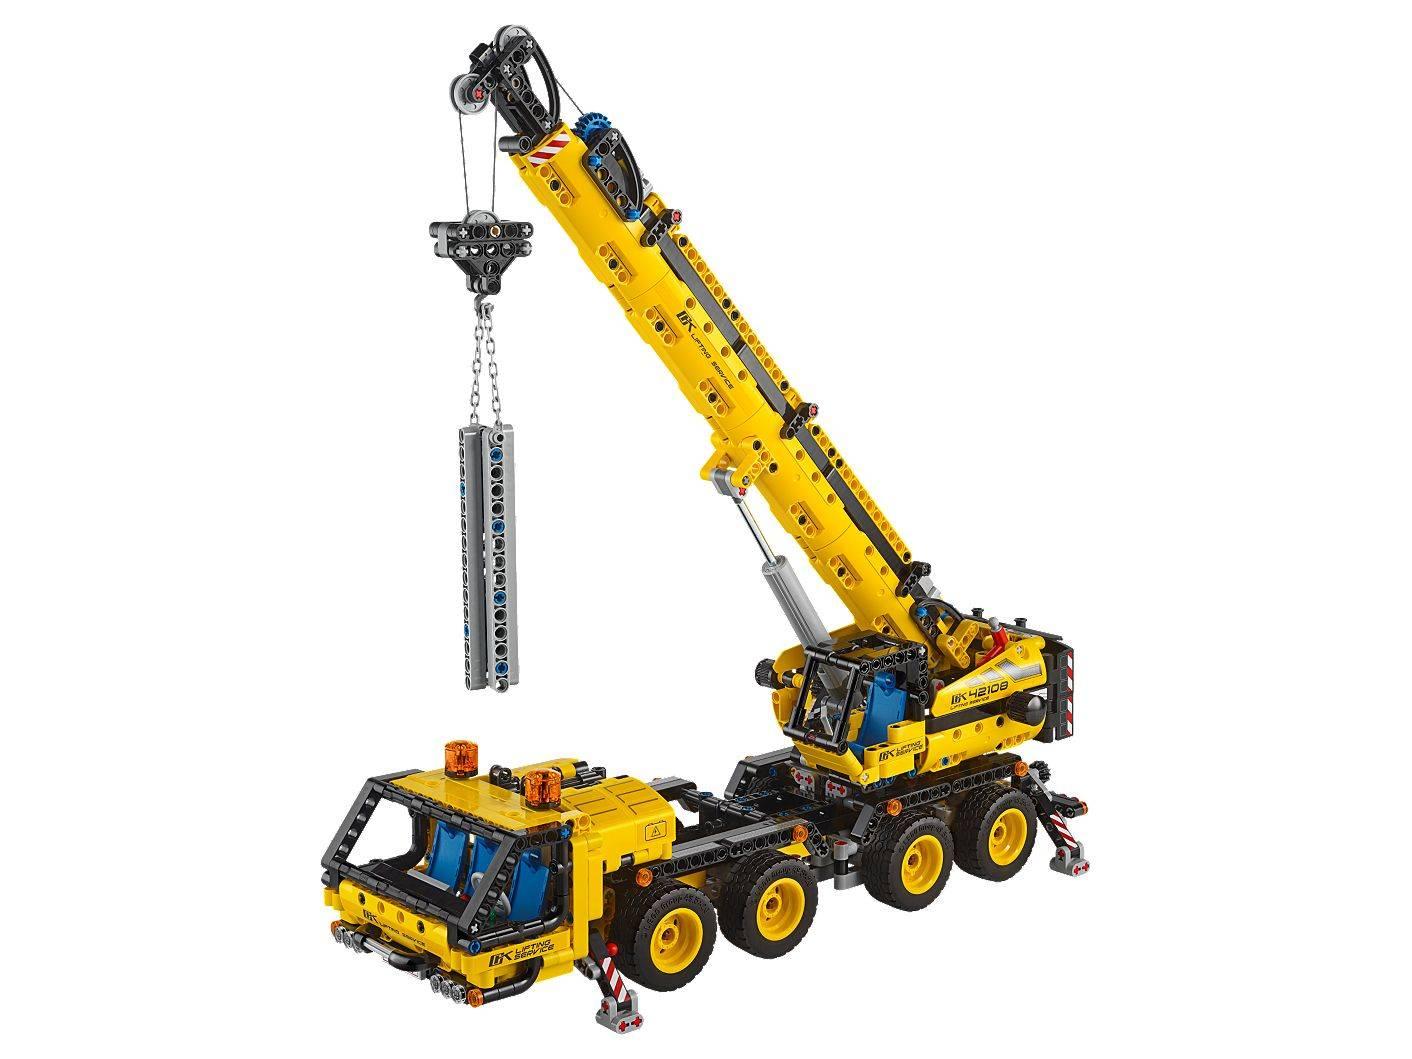 lego 42108 crane size